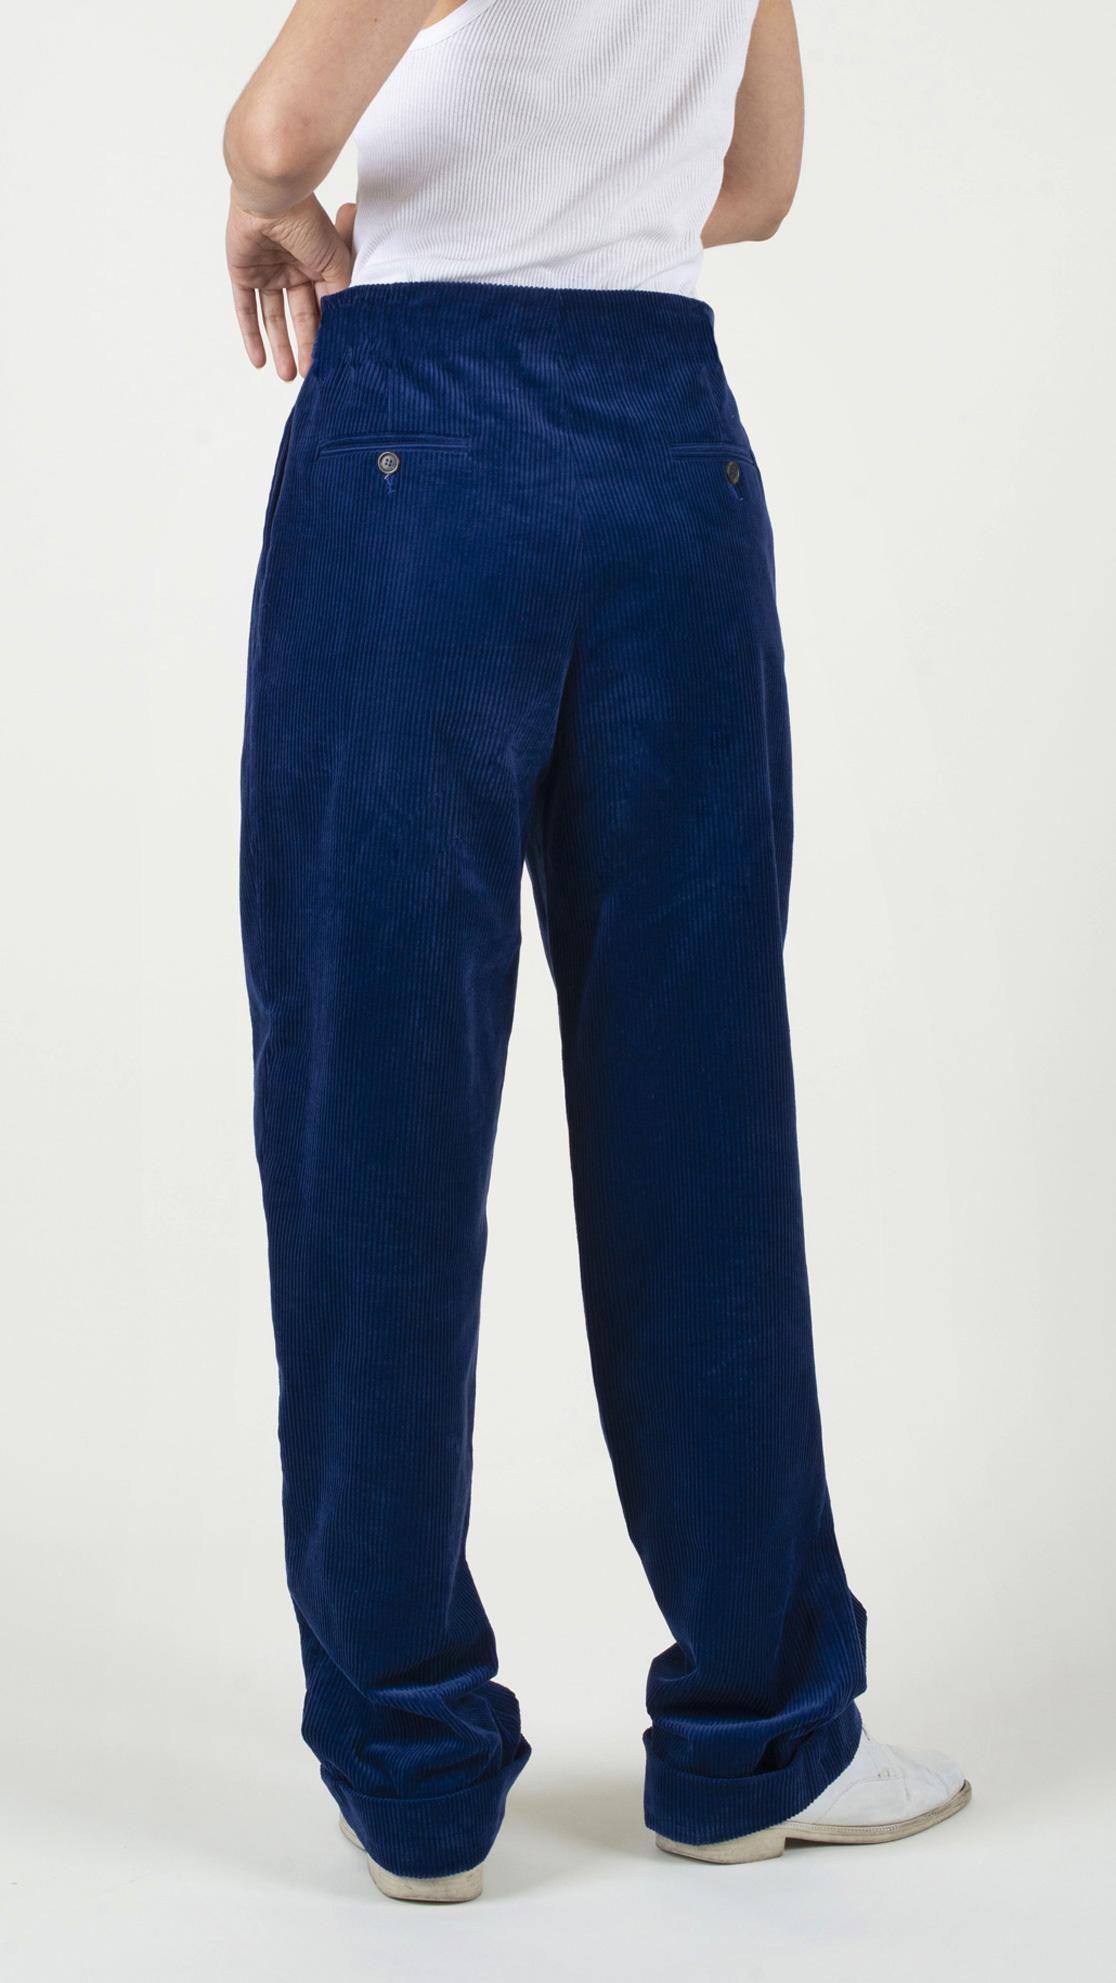 DADA-Diane-Ducasse-AH21-pantalon-droit-jules-velours-bleu-roi-dos